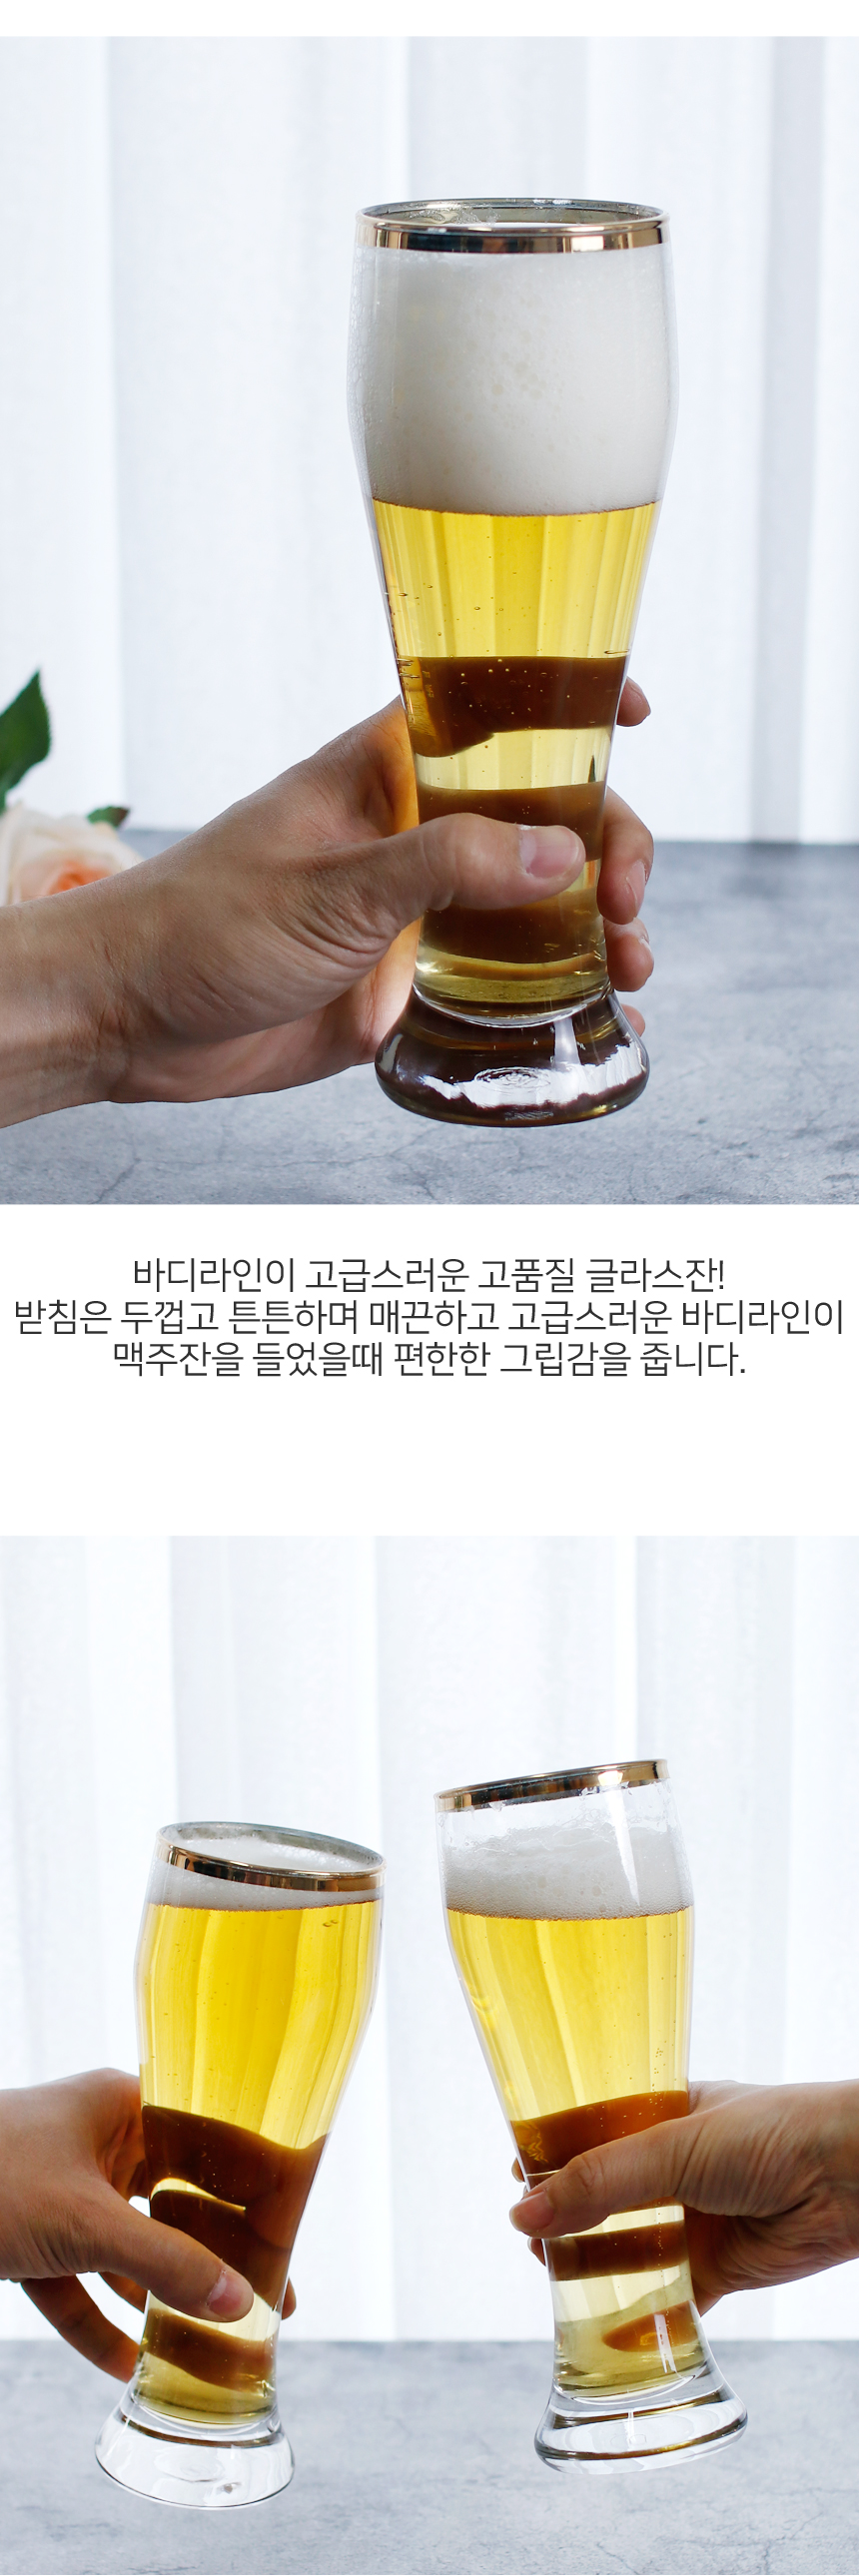 MISO 핸드페인팅 골드라인 유리맥주잔 470ml 1P - 김씨하우스, 15,200원, 유리컵/술잔, 유리컵